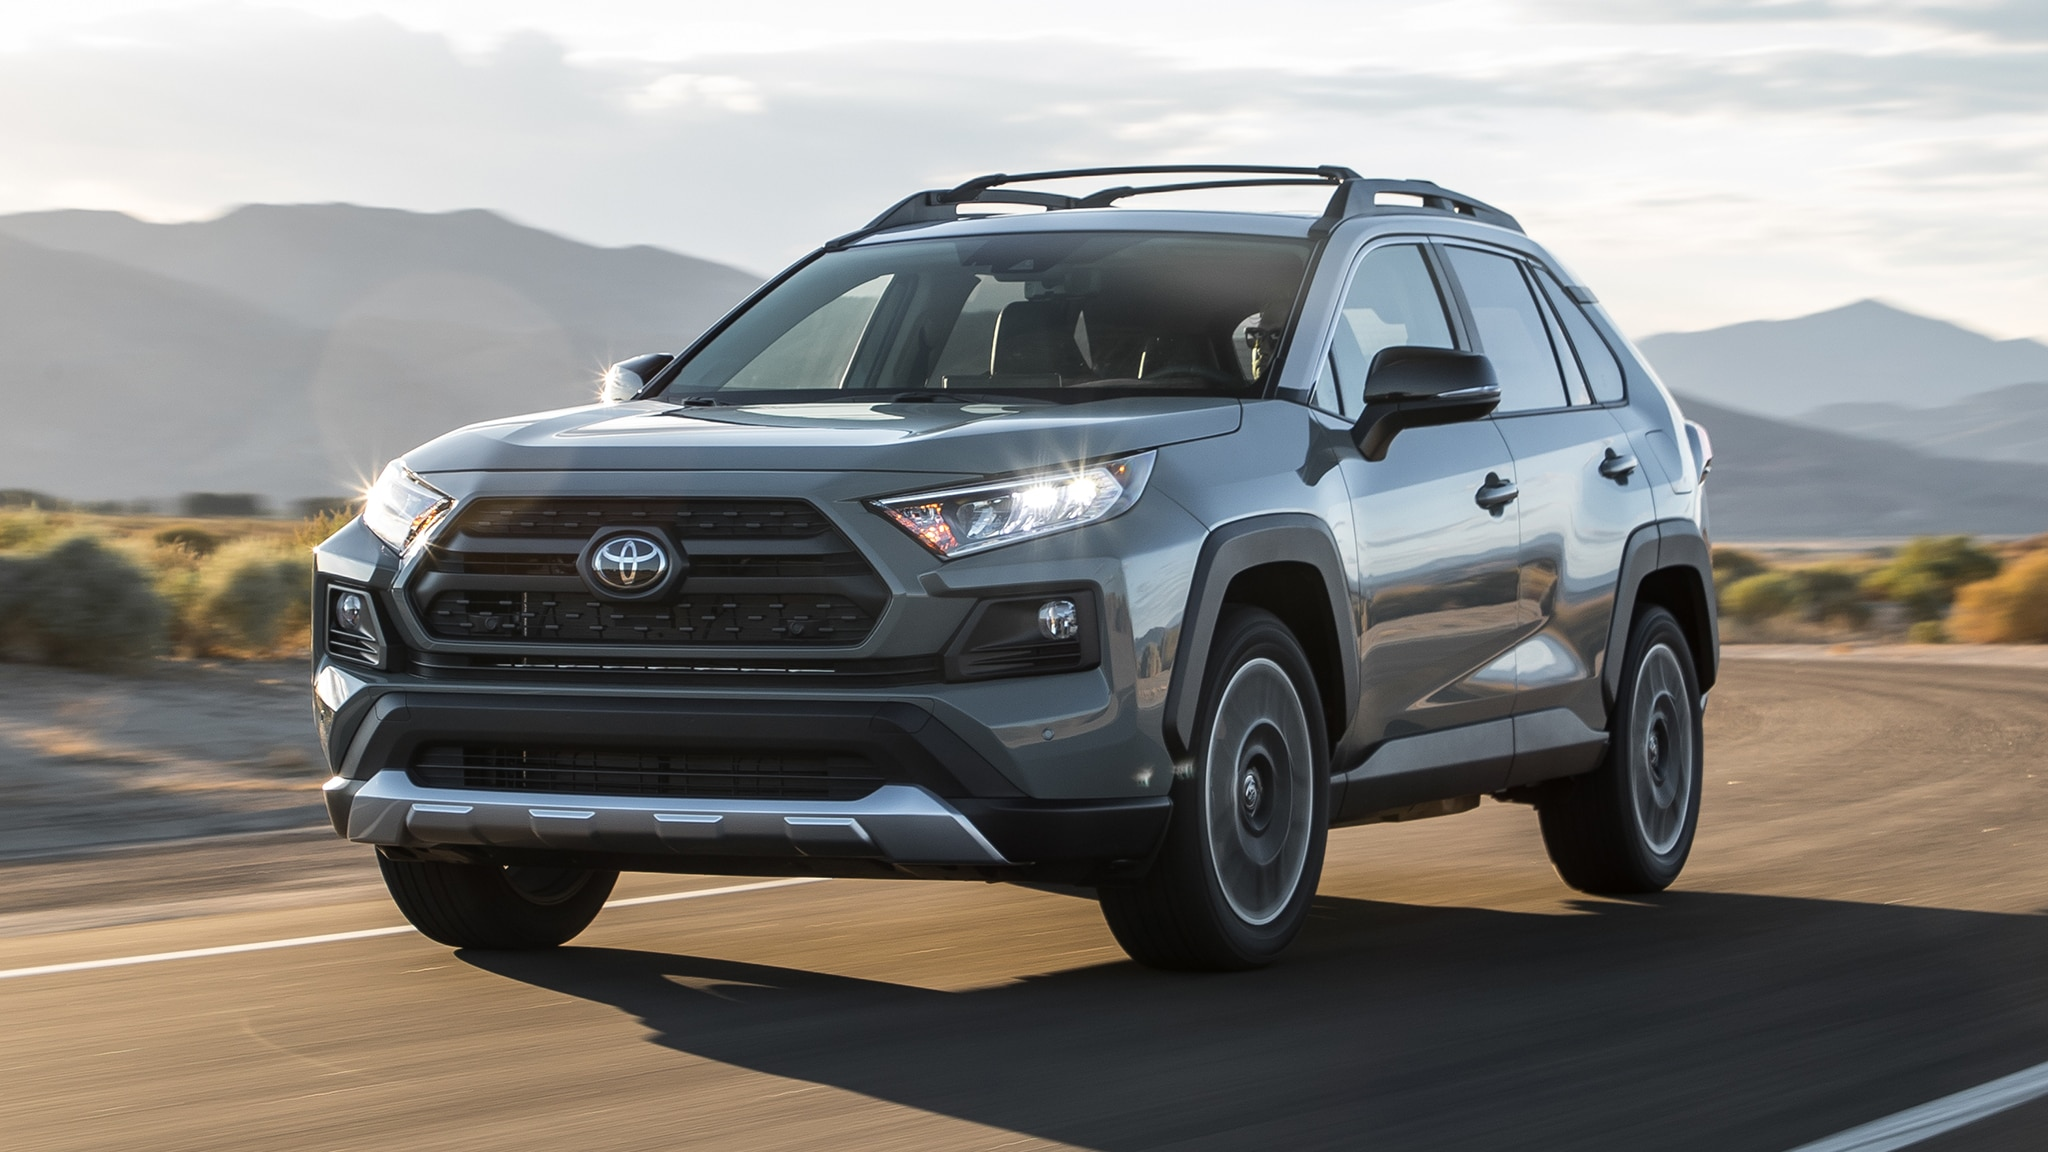 2019 Toyota RAV4 Adventure Front Three Quarter In Motion 1